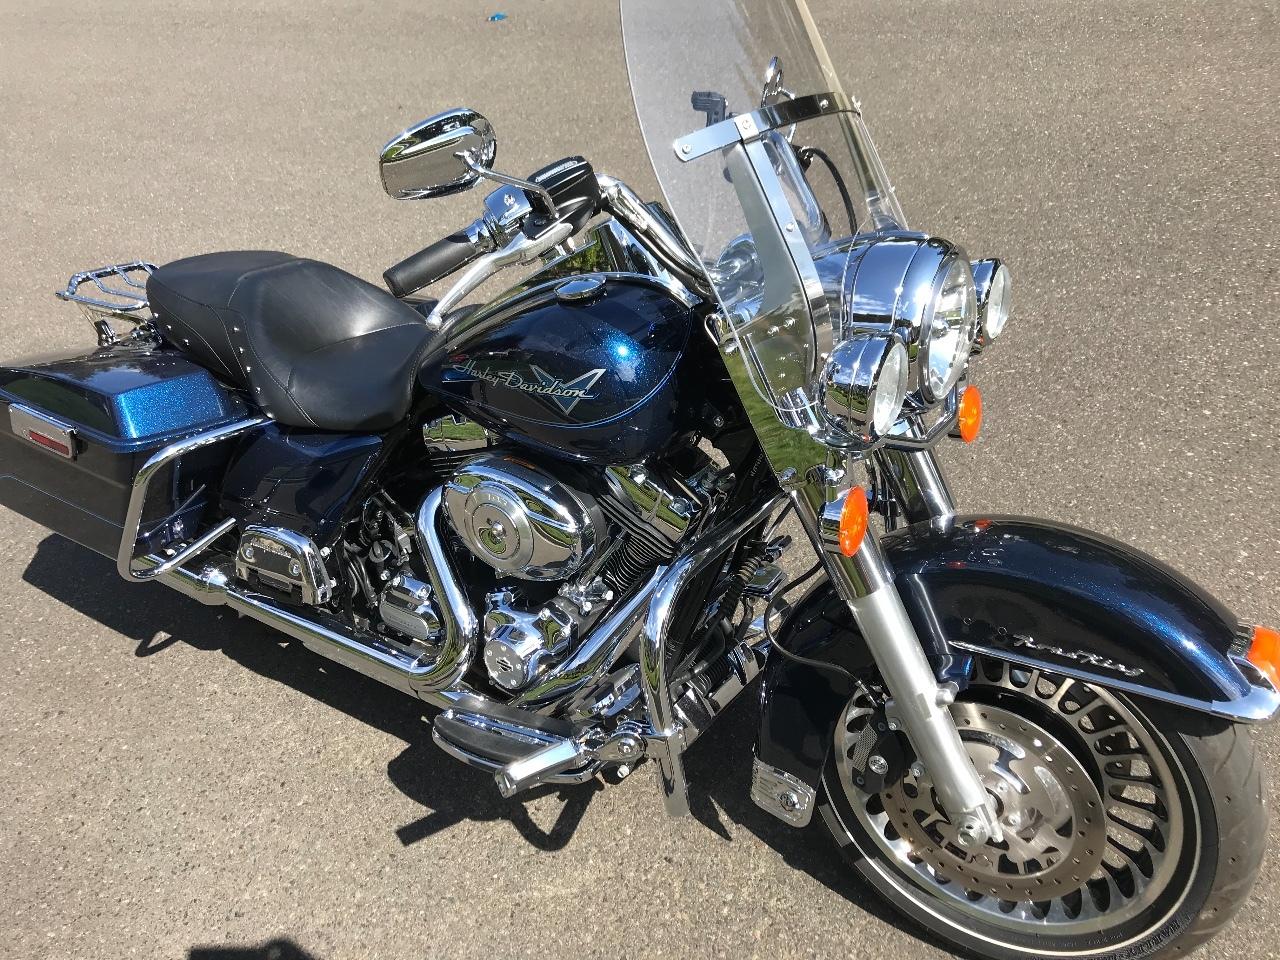 Road King Flhr Gangsta Cholo Style For Sale - Harley Davidson